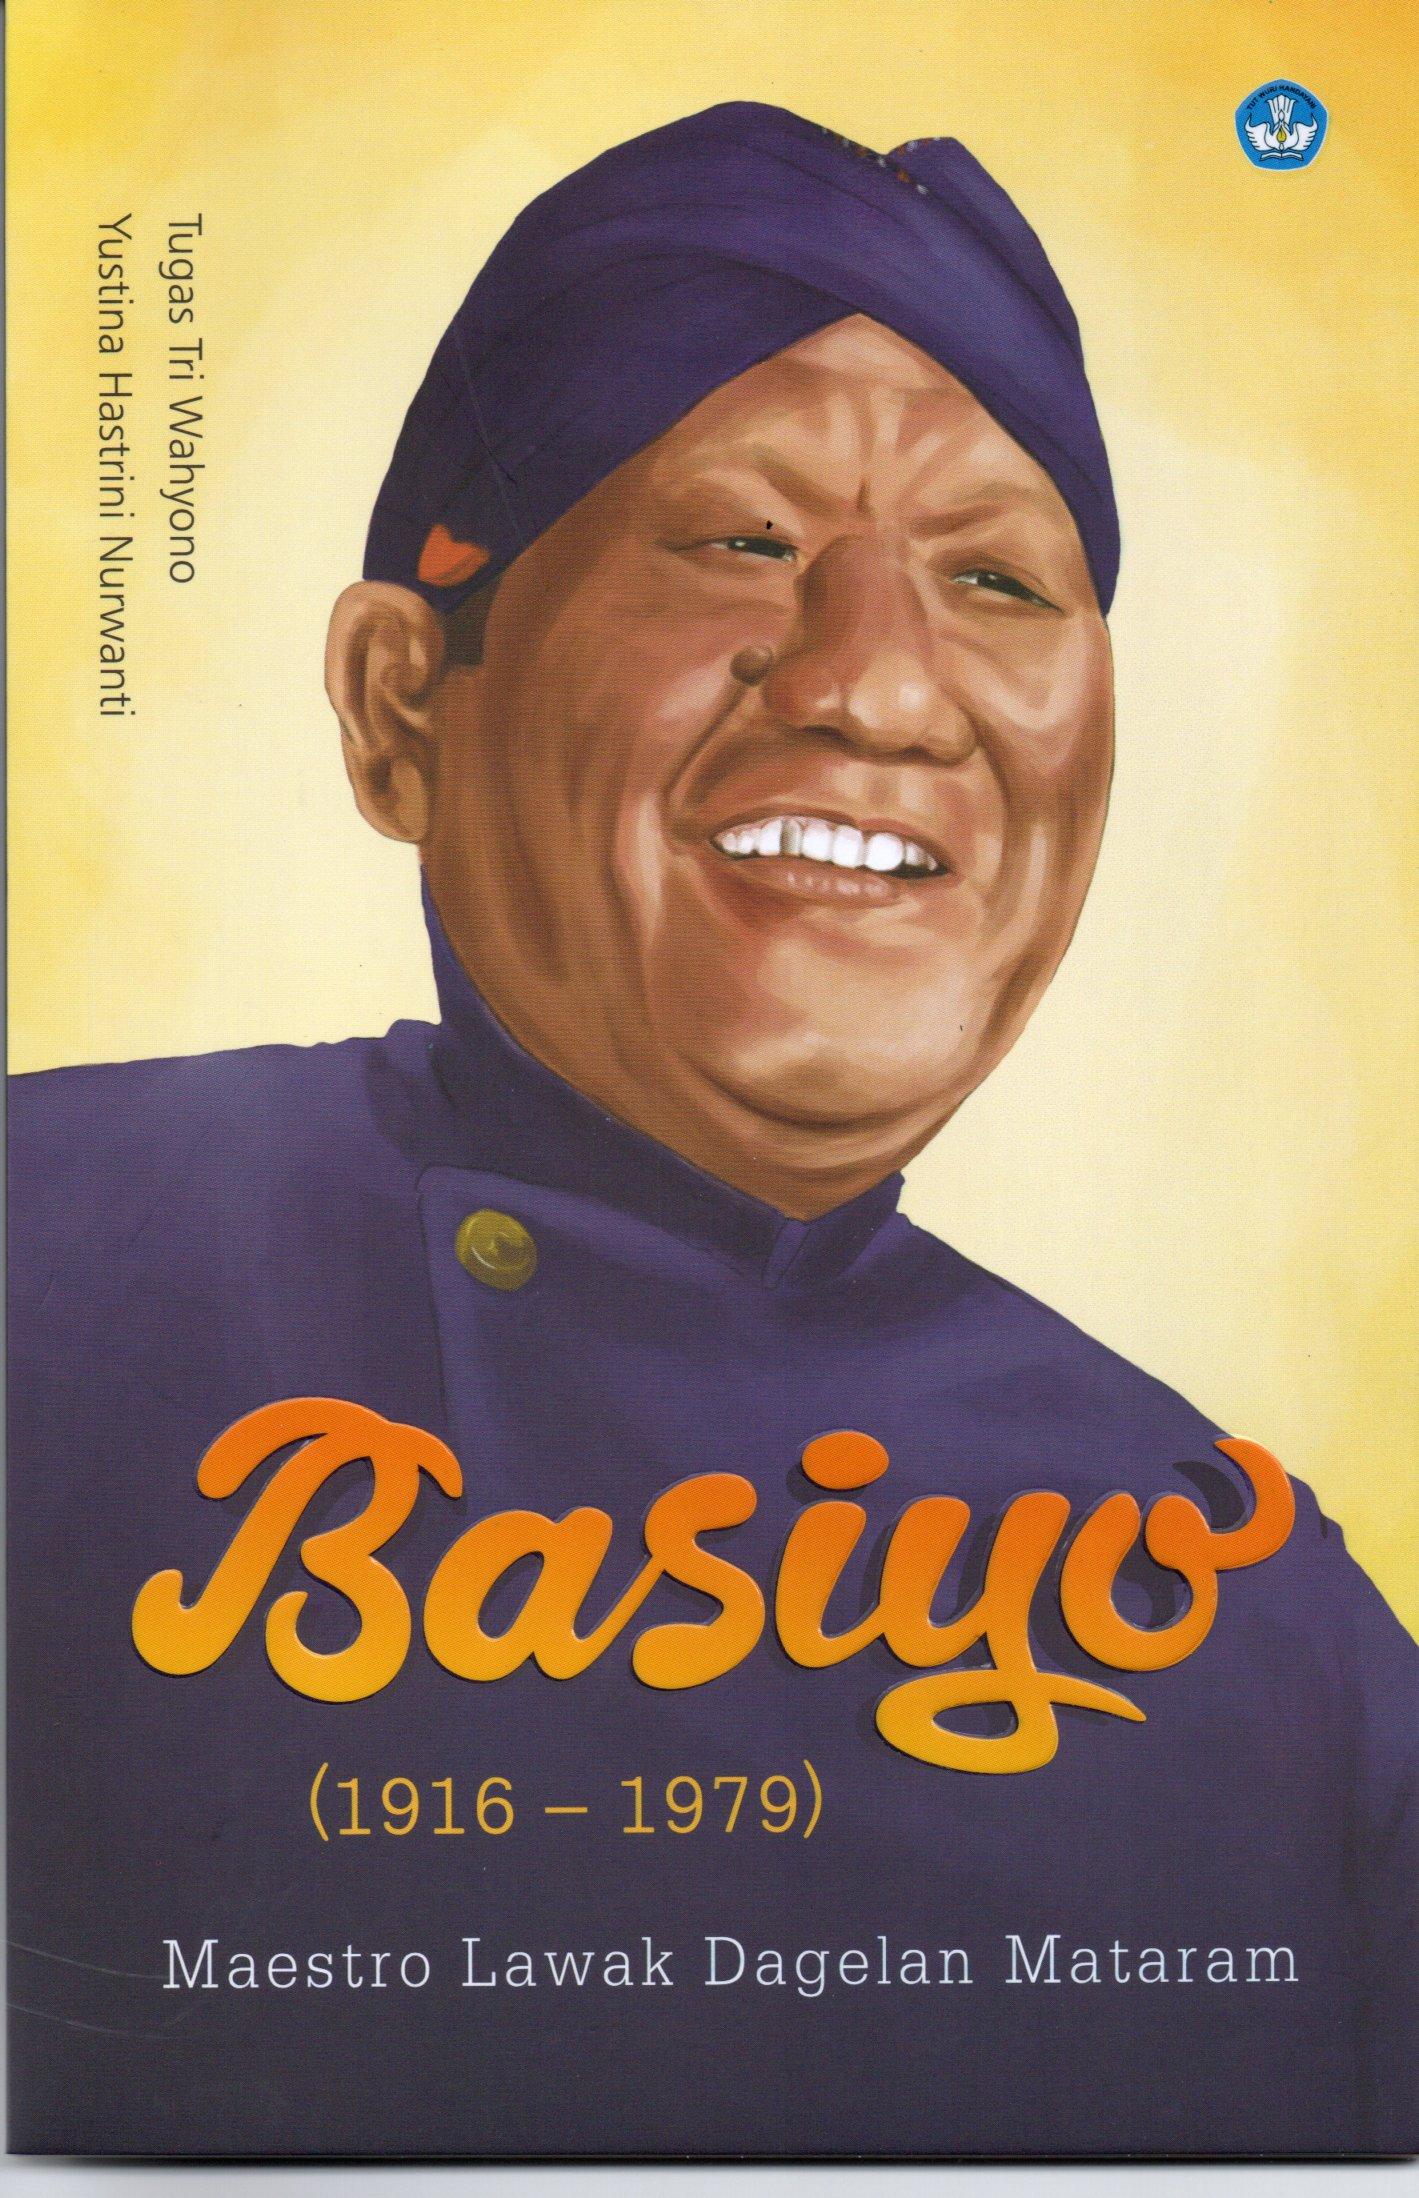 Basiyo (1916 - 1979) Maestro lawak dagelan Mataram  / Tugas Tri Wahyono